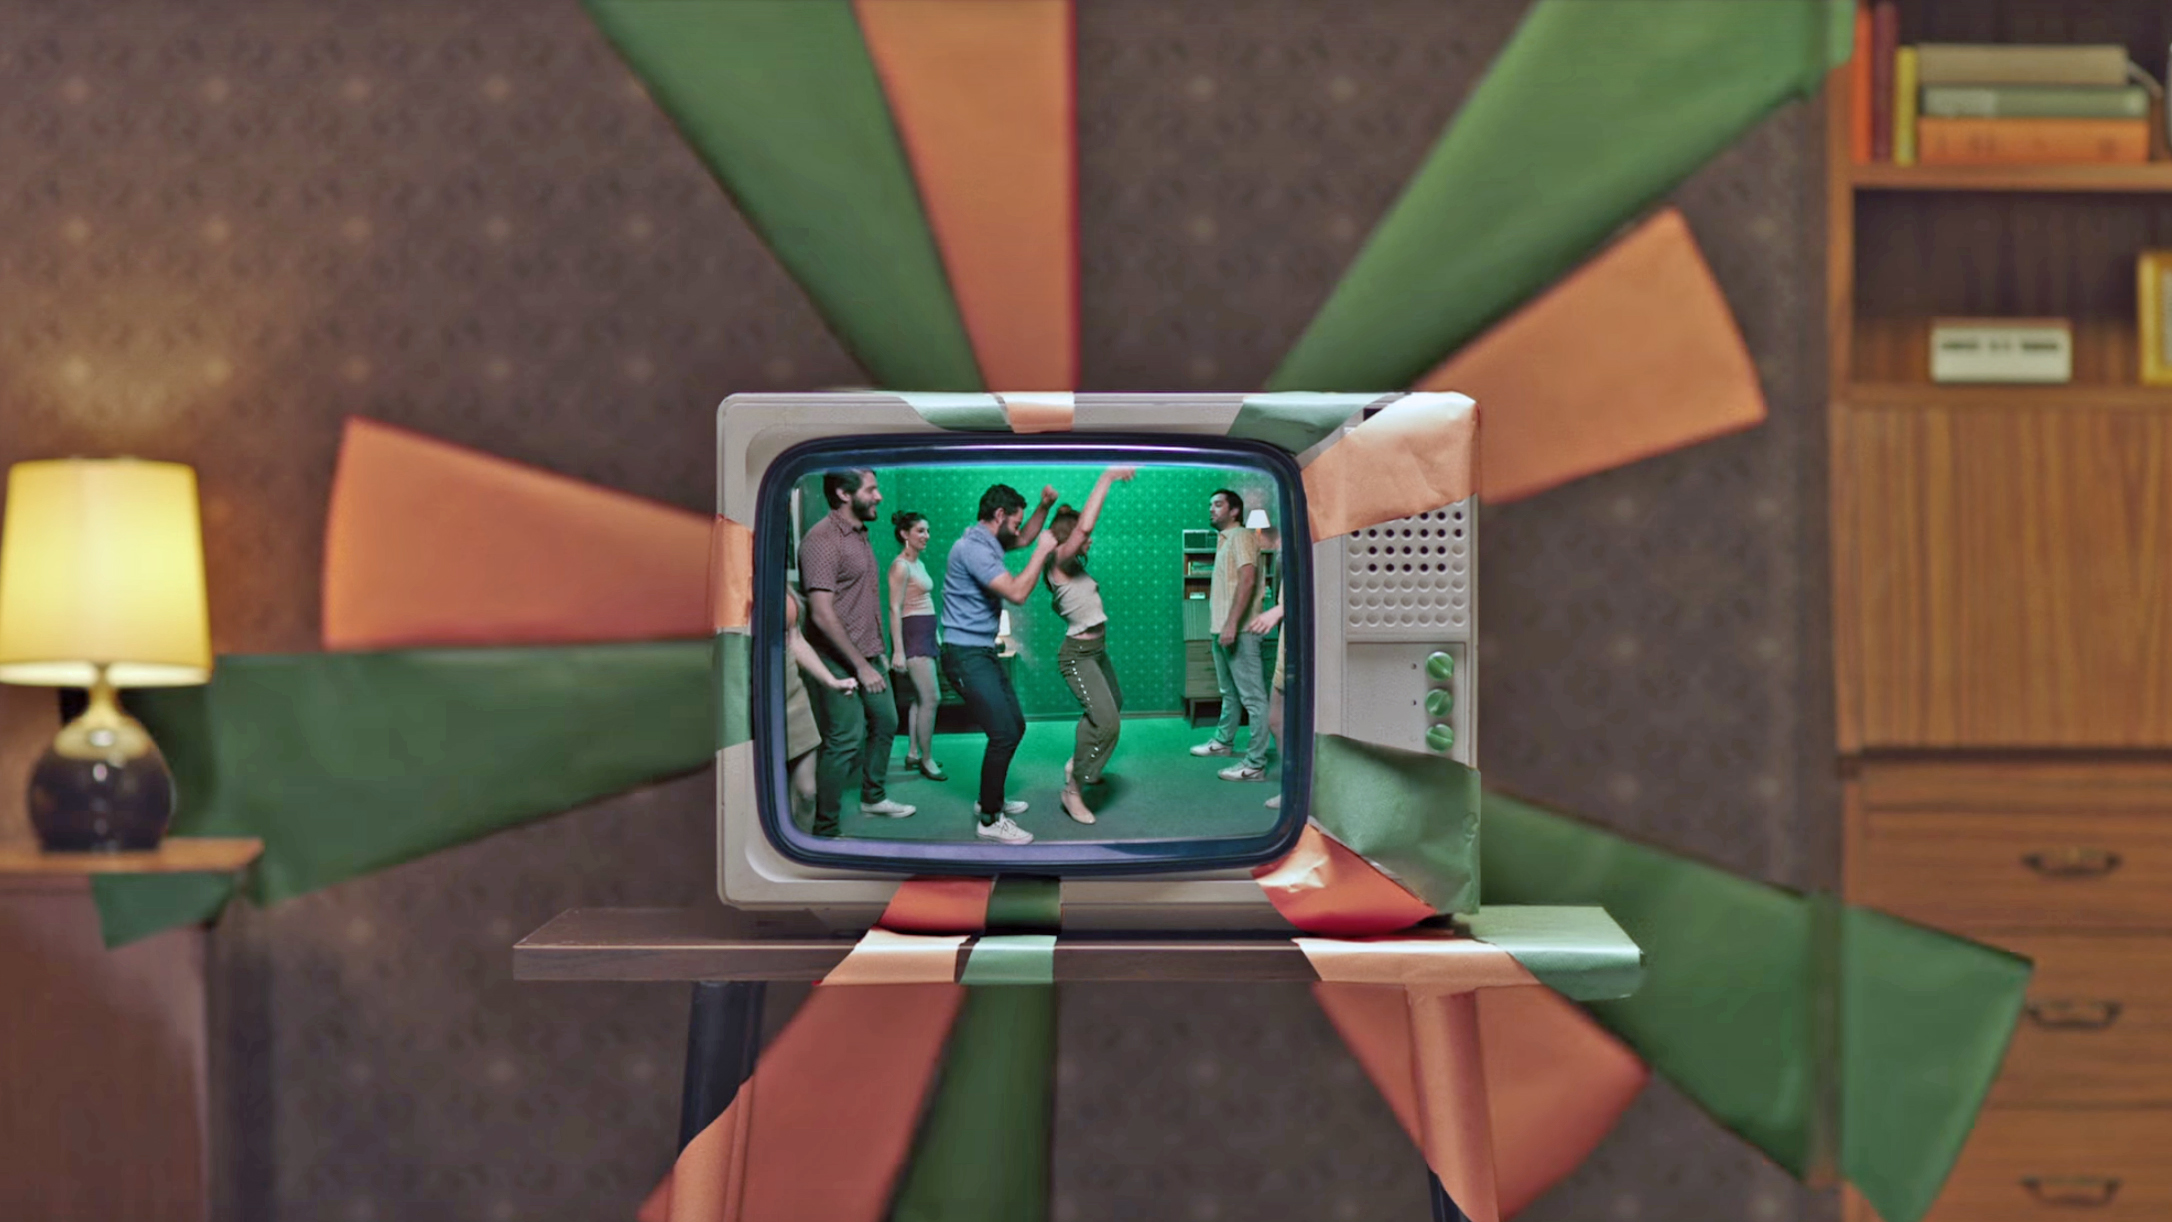 Funky Fiesta - Rawayana feat. José Luis Pardo (Dj Afro) Spanish and English lyrics